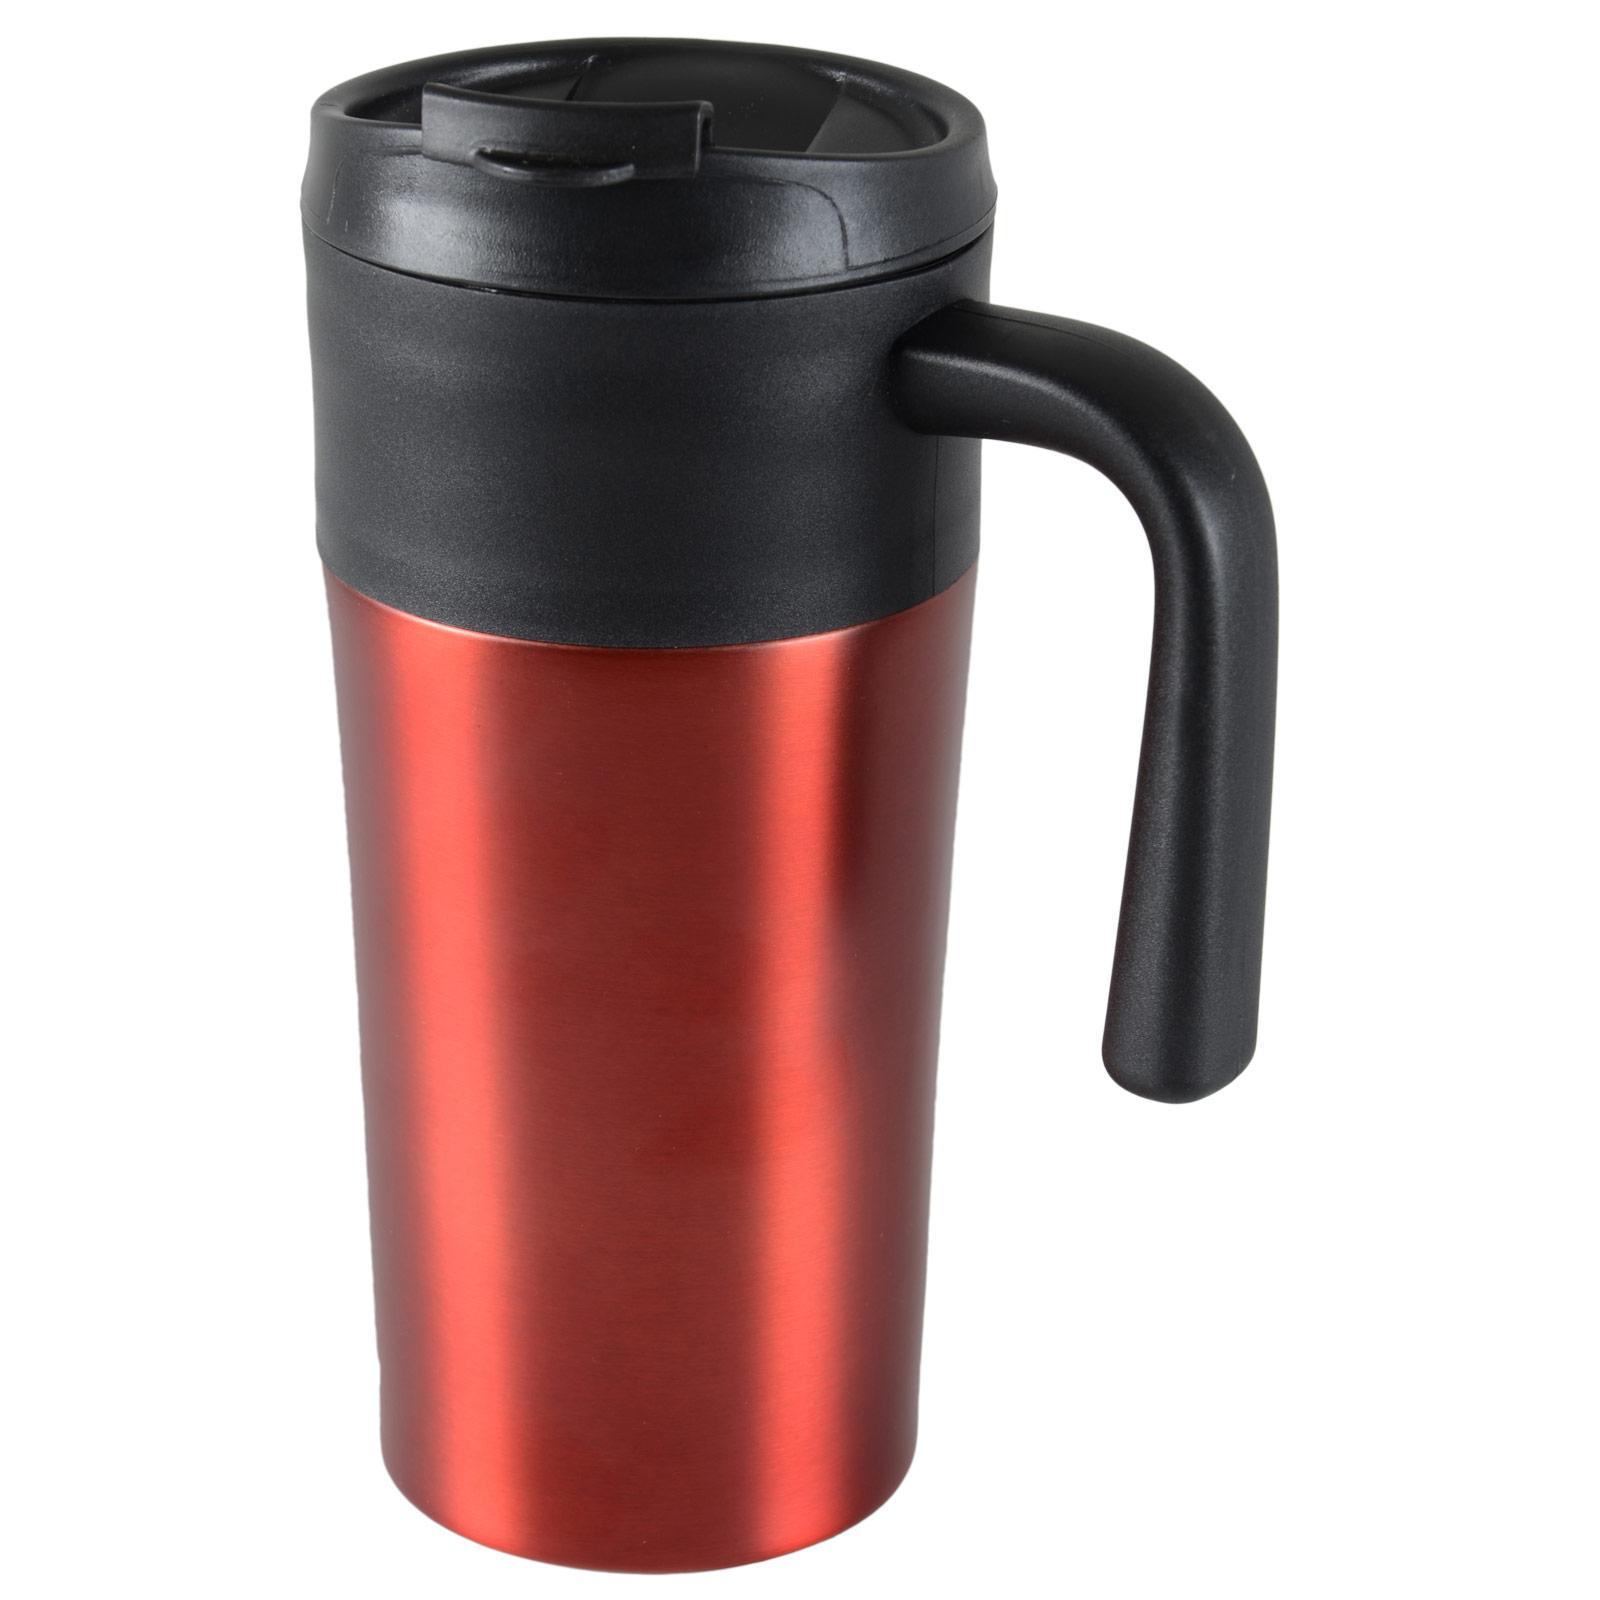 Tazza 450ml Thermal Mug Hot Warm Drinks Coffee